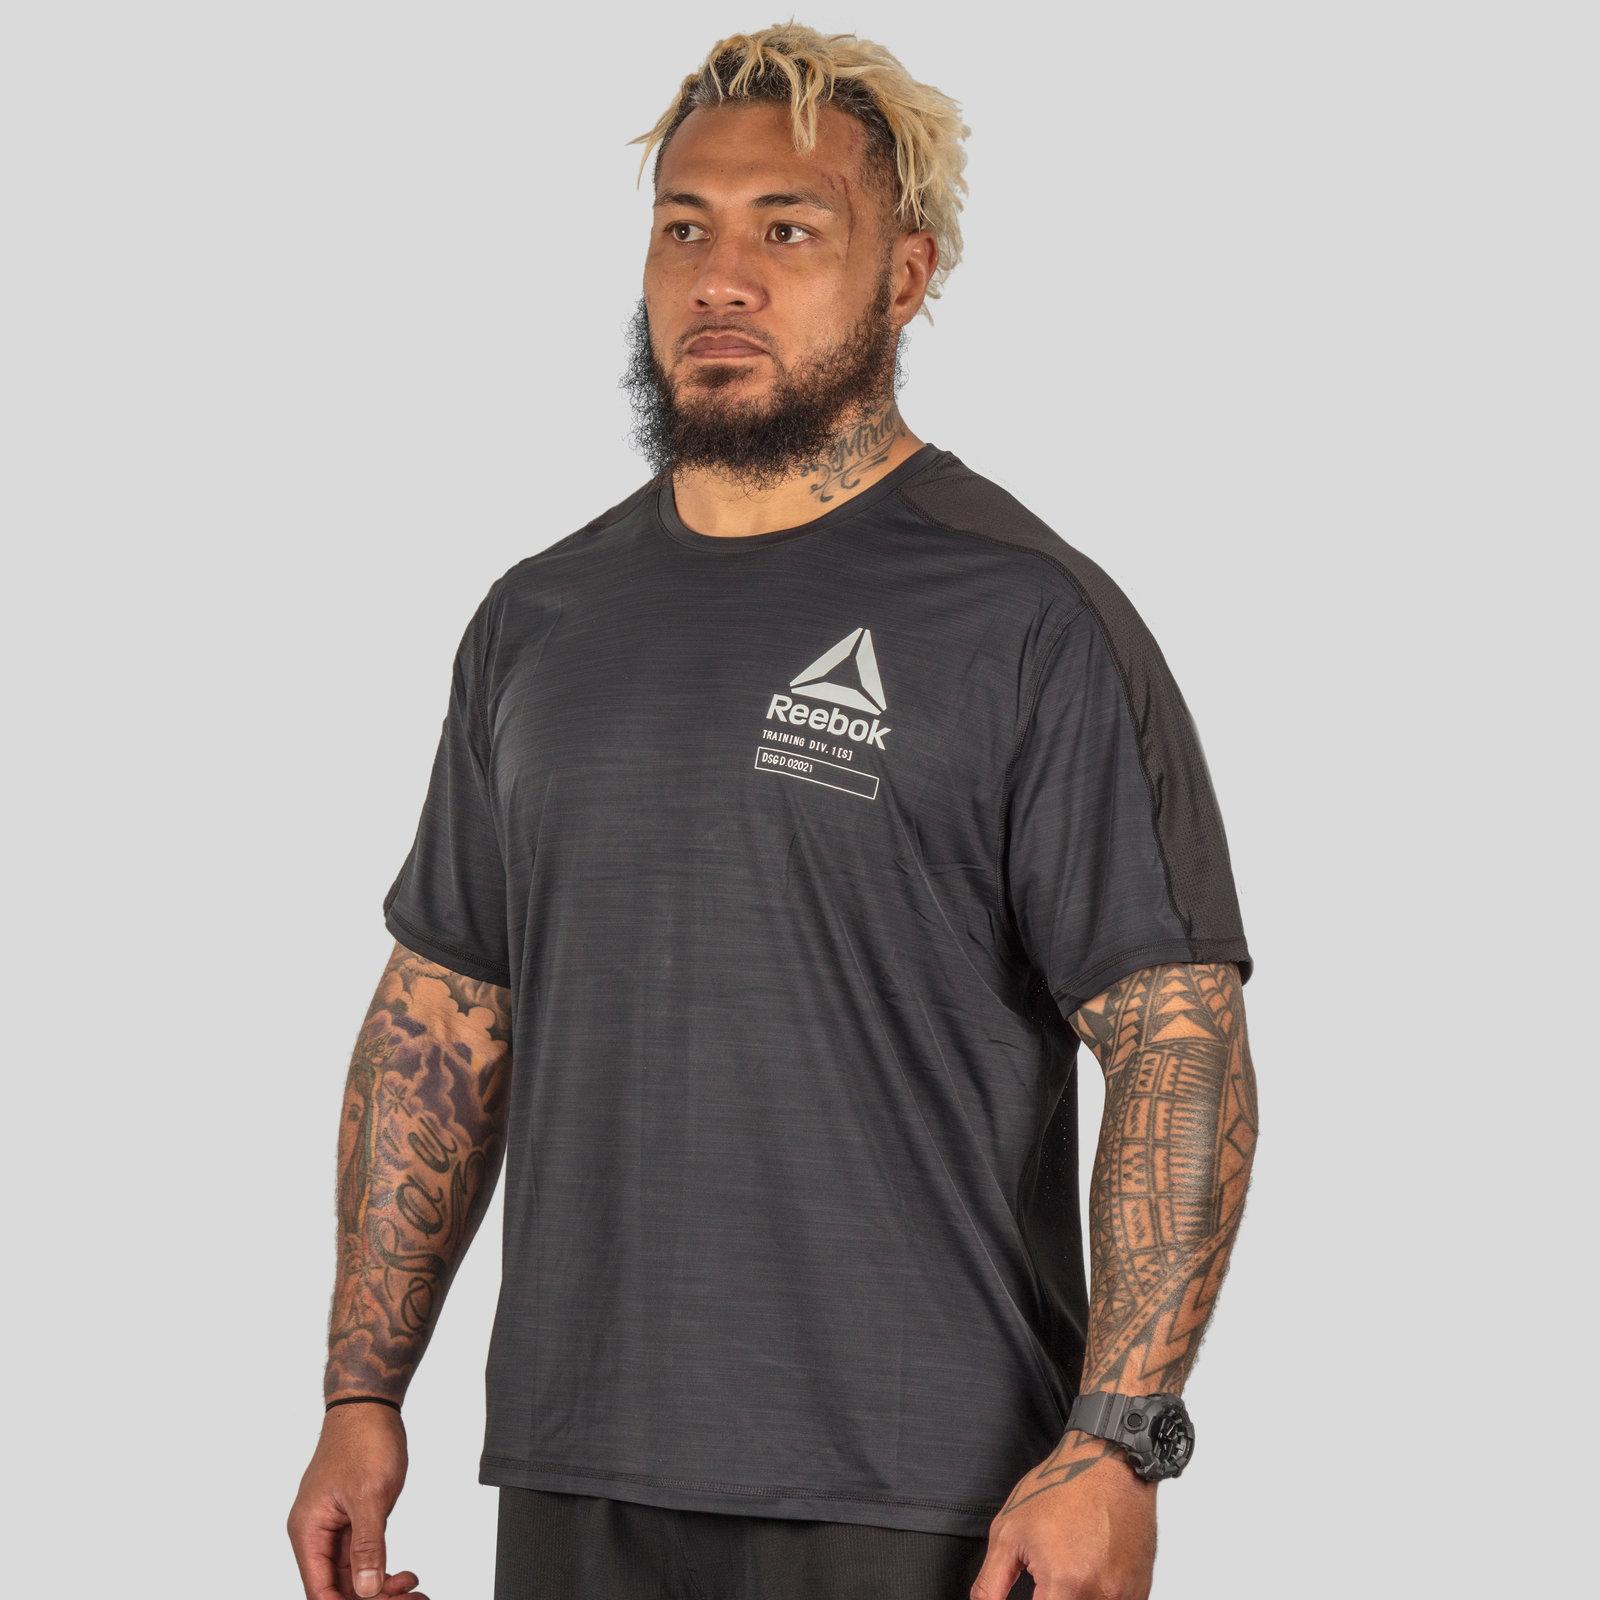 Image of Activchill Graphic S/S Training T-Shirt